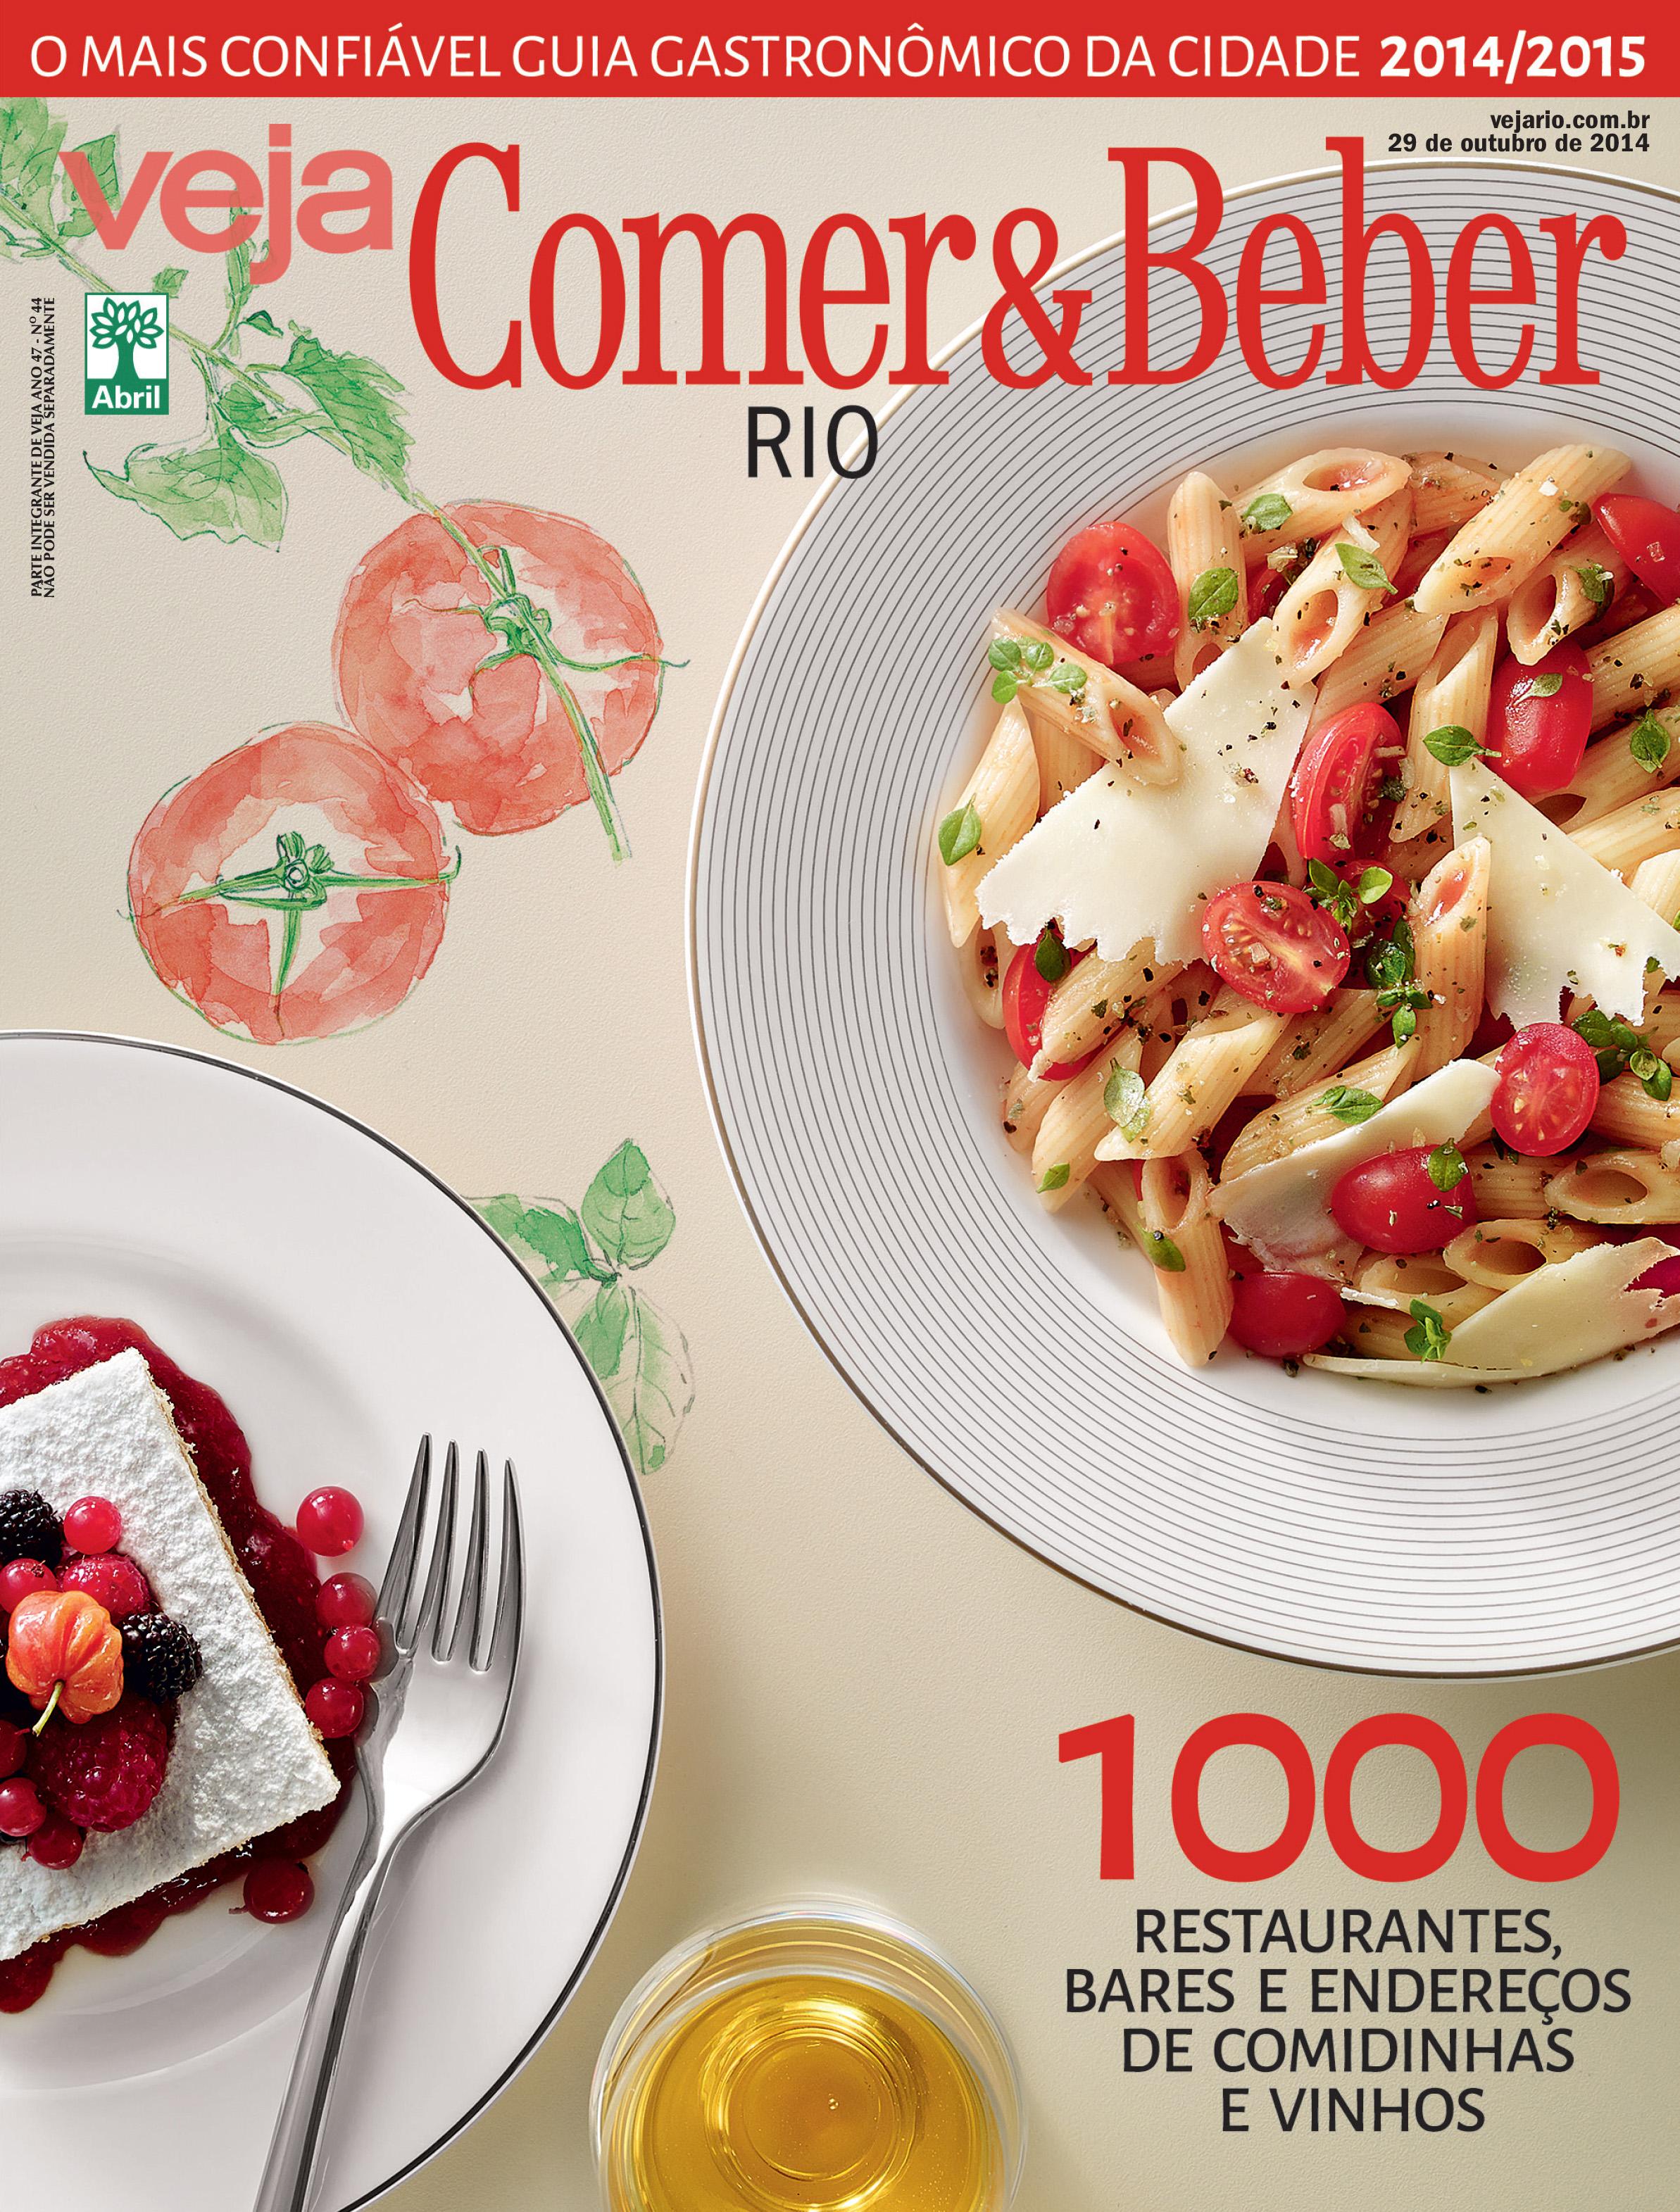 Capa da revista VEJA Rio Comer & Beber, 29 de Outubro de 2014: